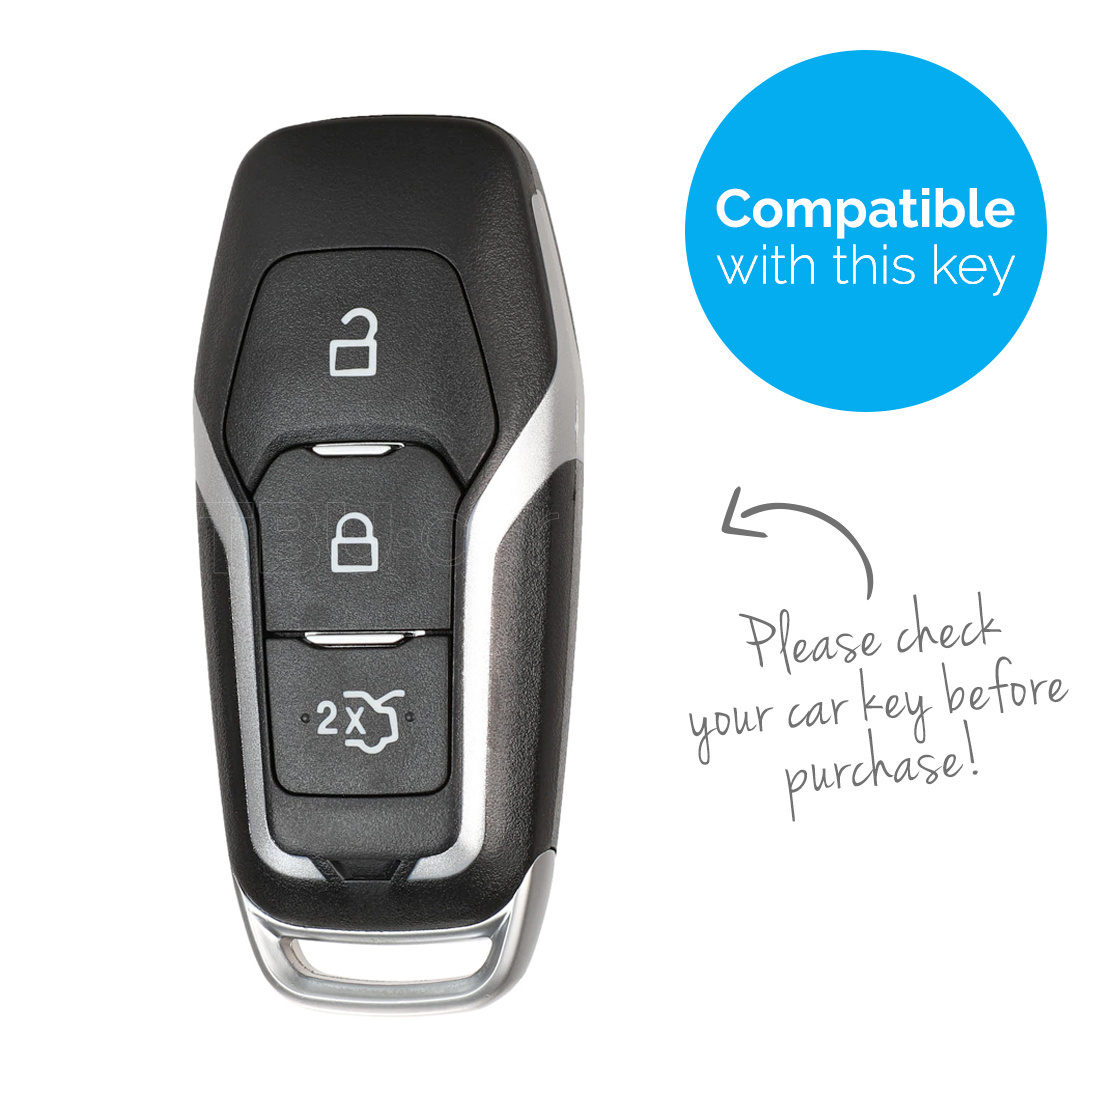 TBU car TBU car Autoschlüssel Hülle kompatibel mit Ford 3 Tasten (Keyless Entry) - Schutzhülle aus TPU - Auto Schlüsselhülle Cover in Silber Chrom